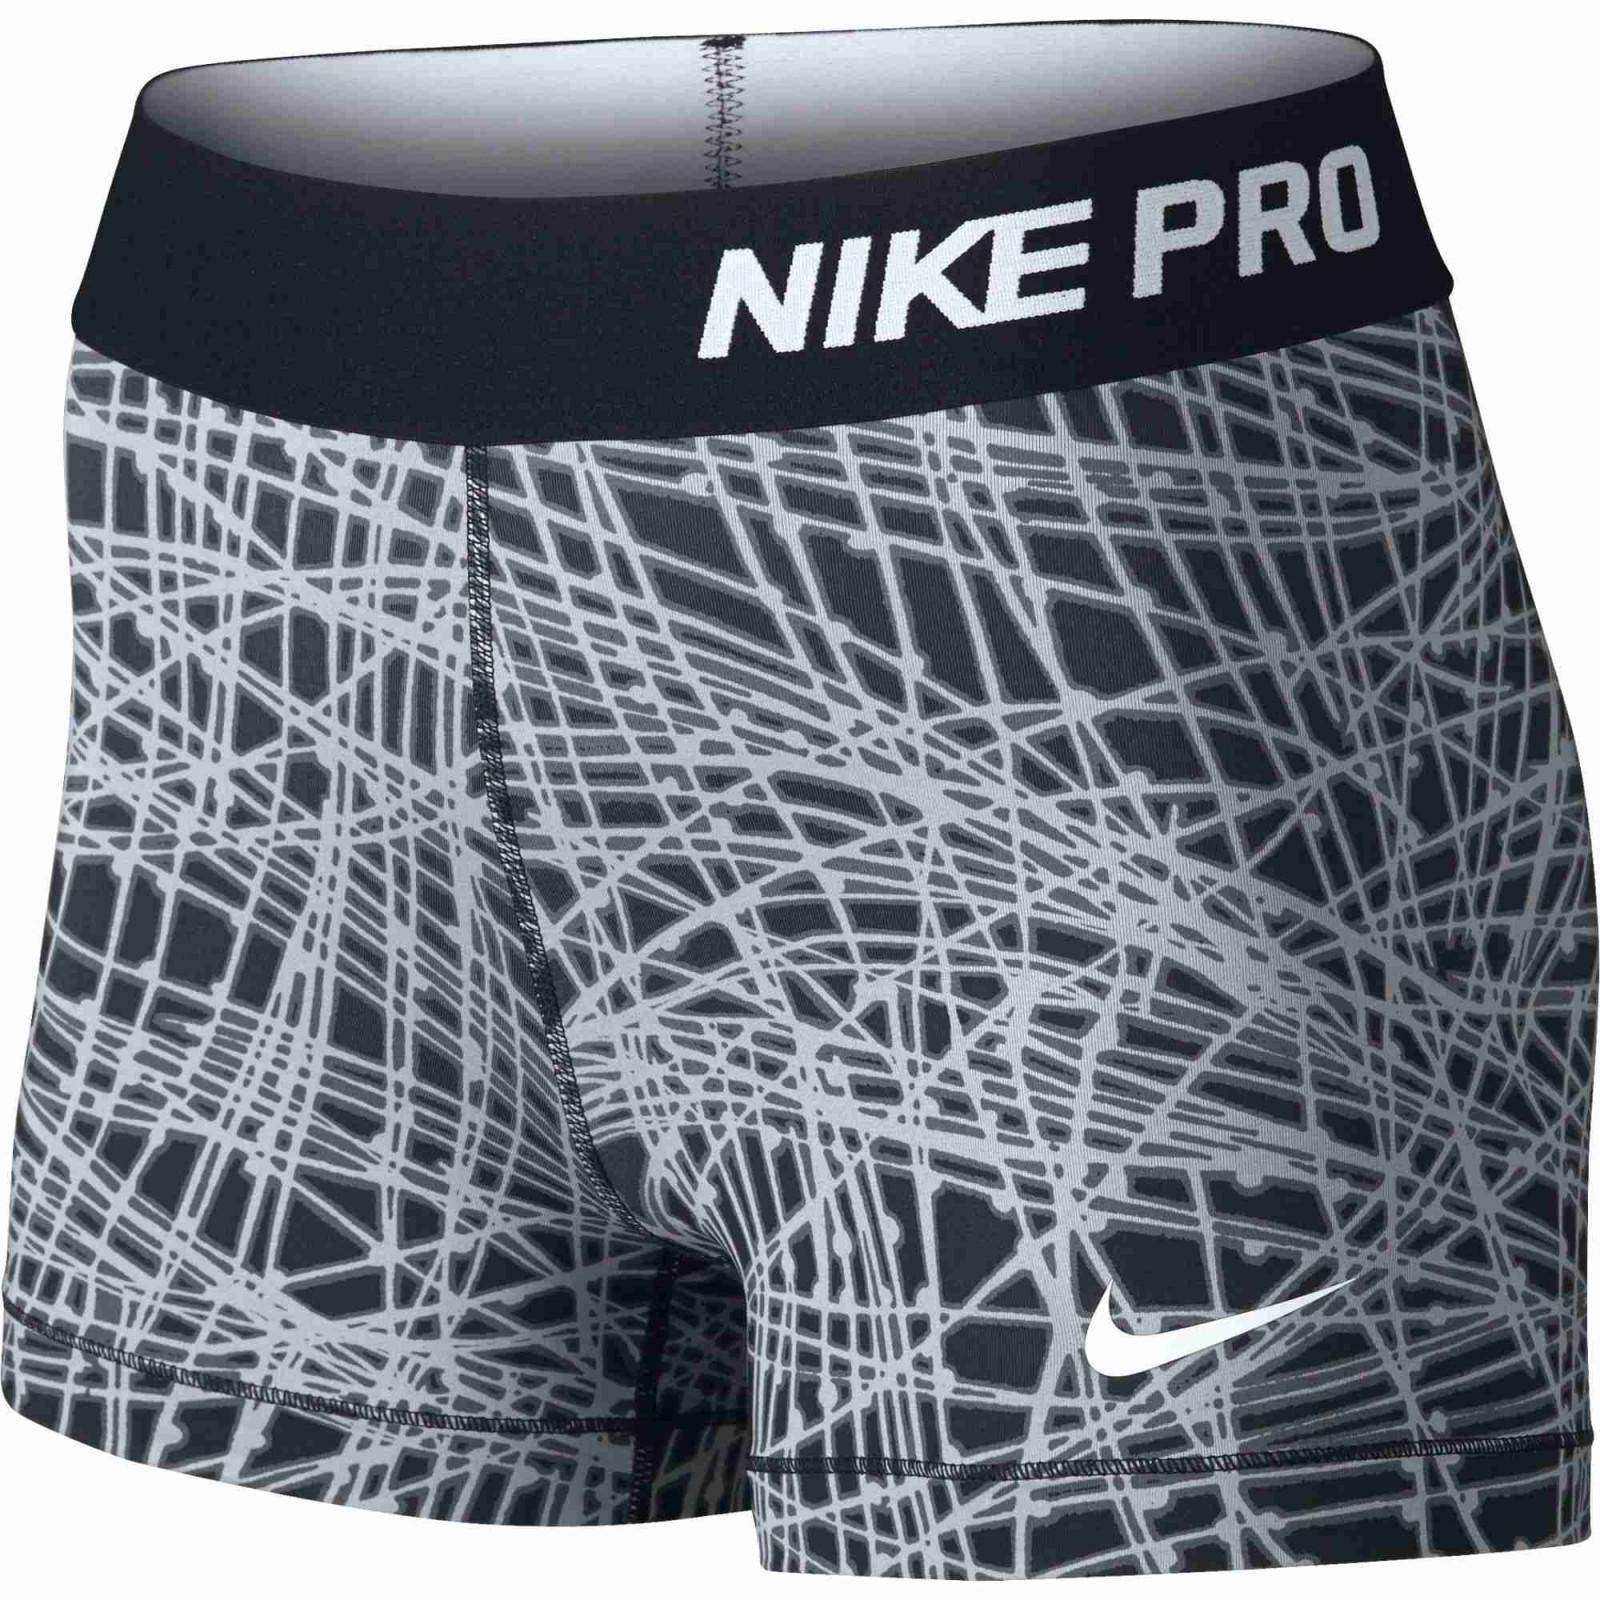 Dámské kraťasy Nike PRO COOL 3 SHORT TRACER  6e9e4a49c5